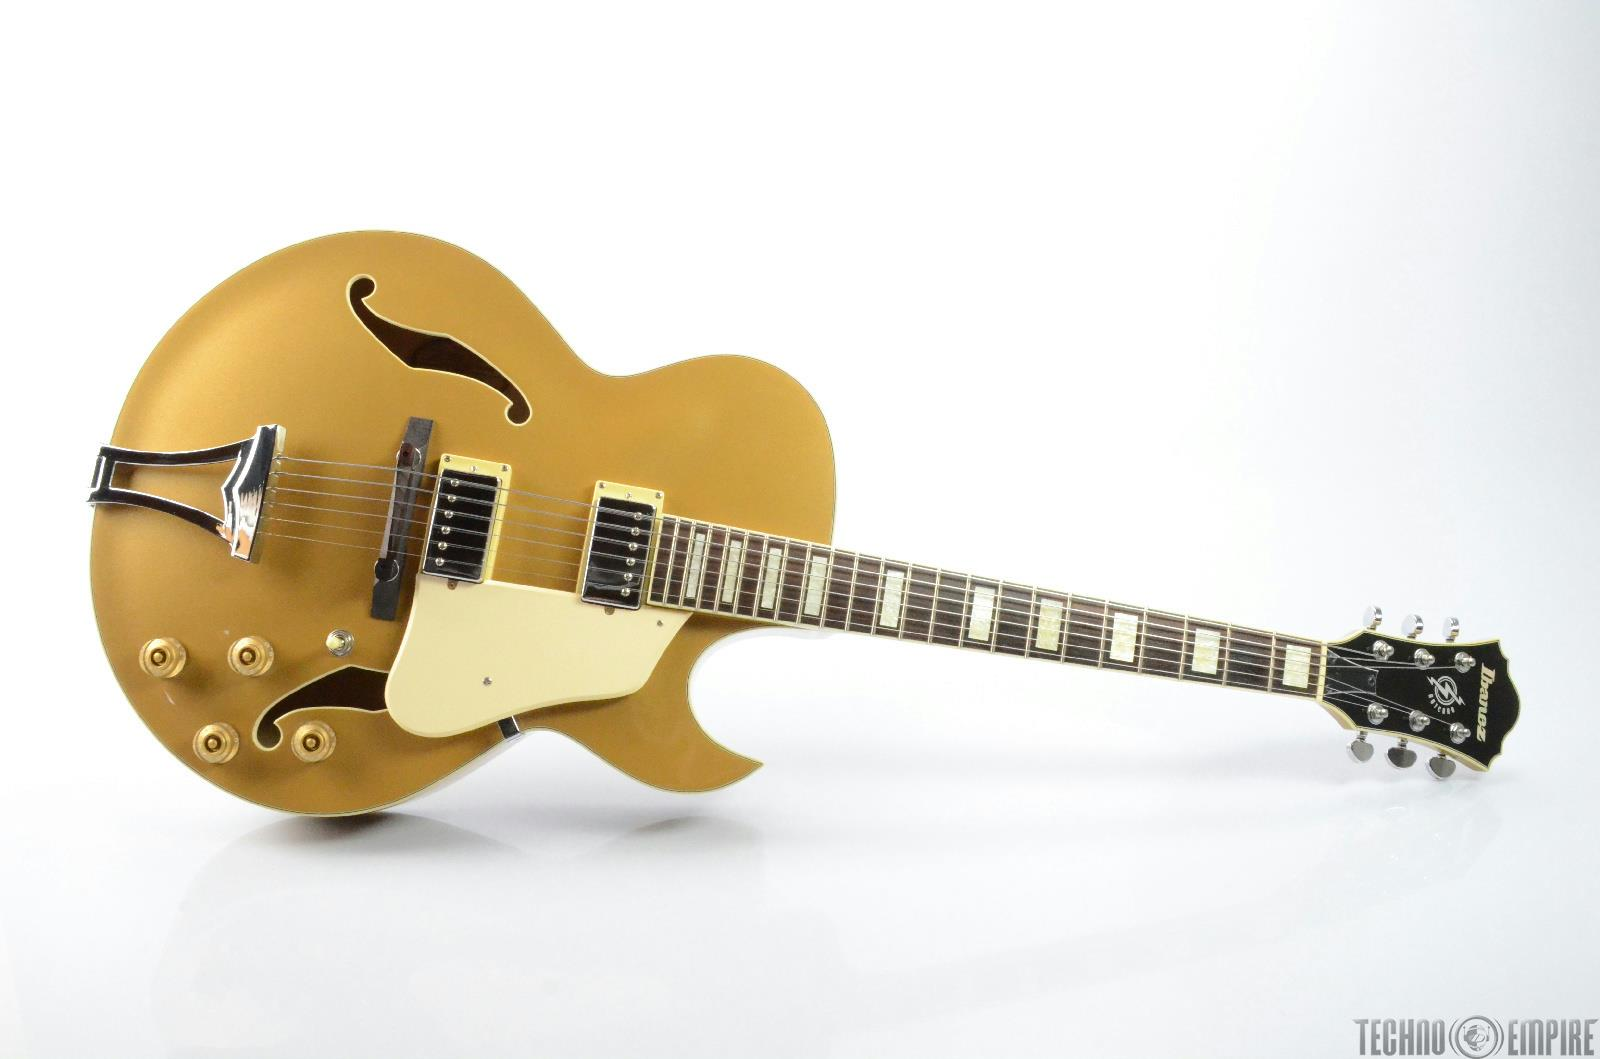 IBANEZ Artcore Series AK75D Hollowbody Electric Guitar w/ Hard Case #26638